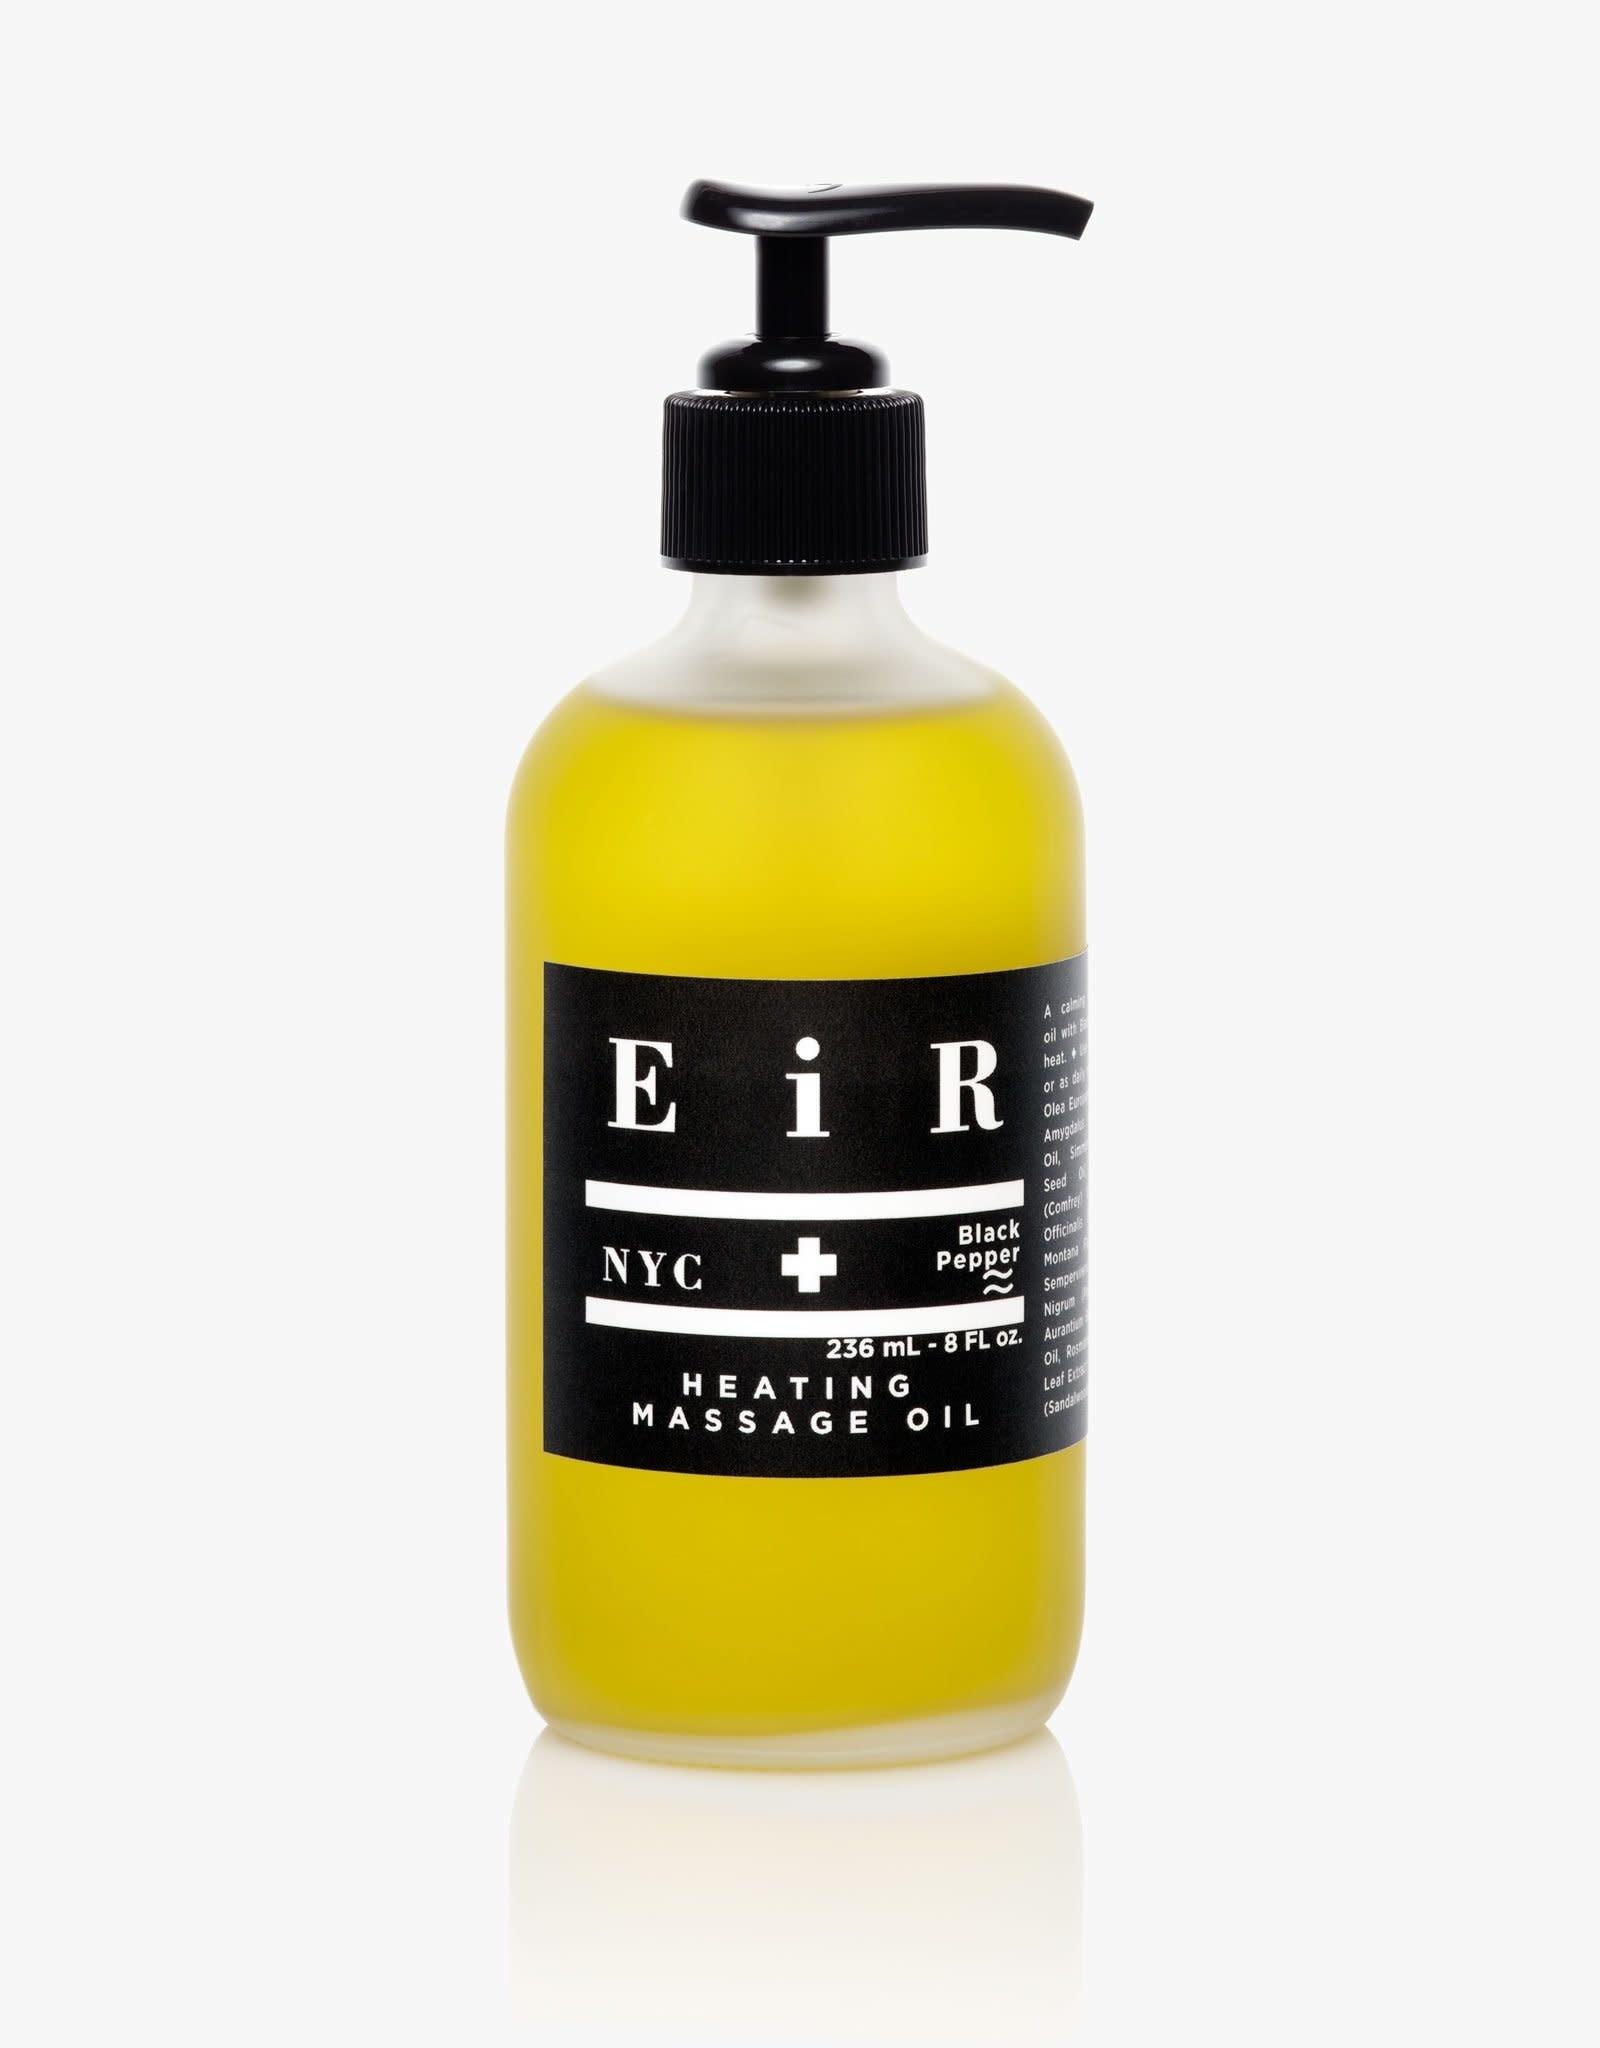 EiR NYC Heating Massage Oil